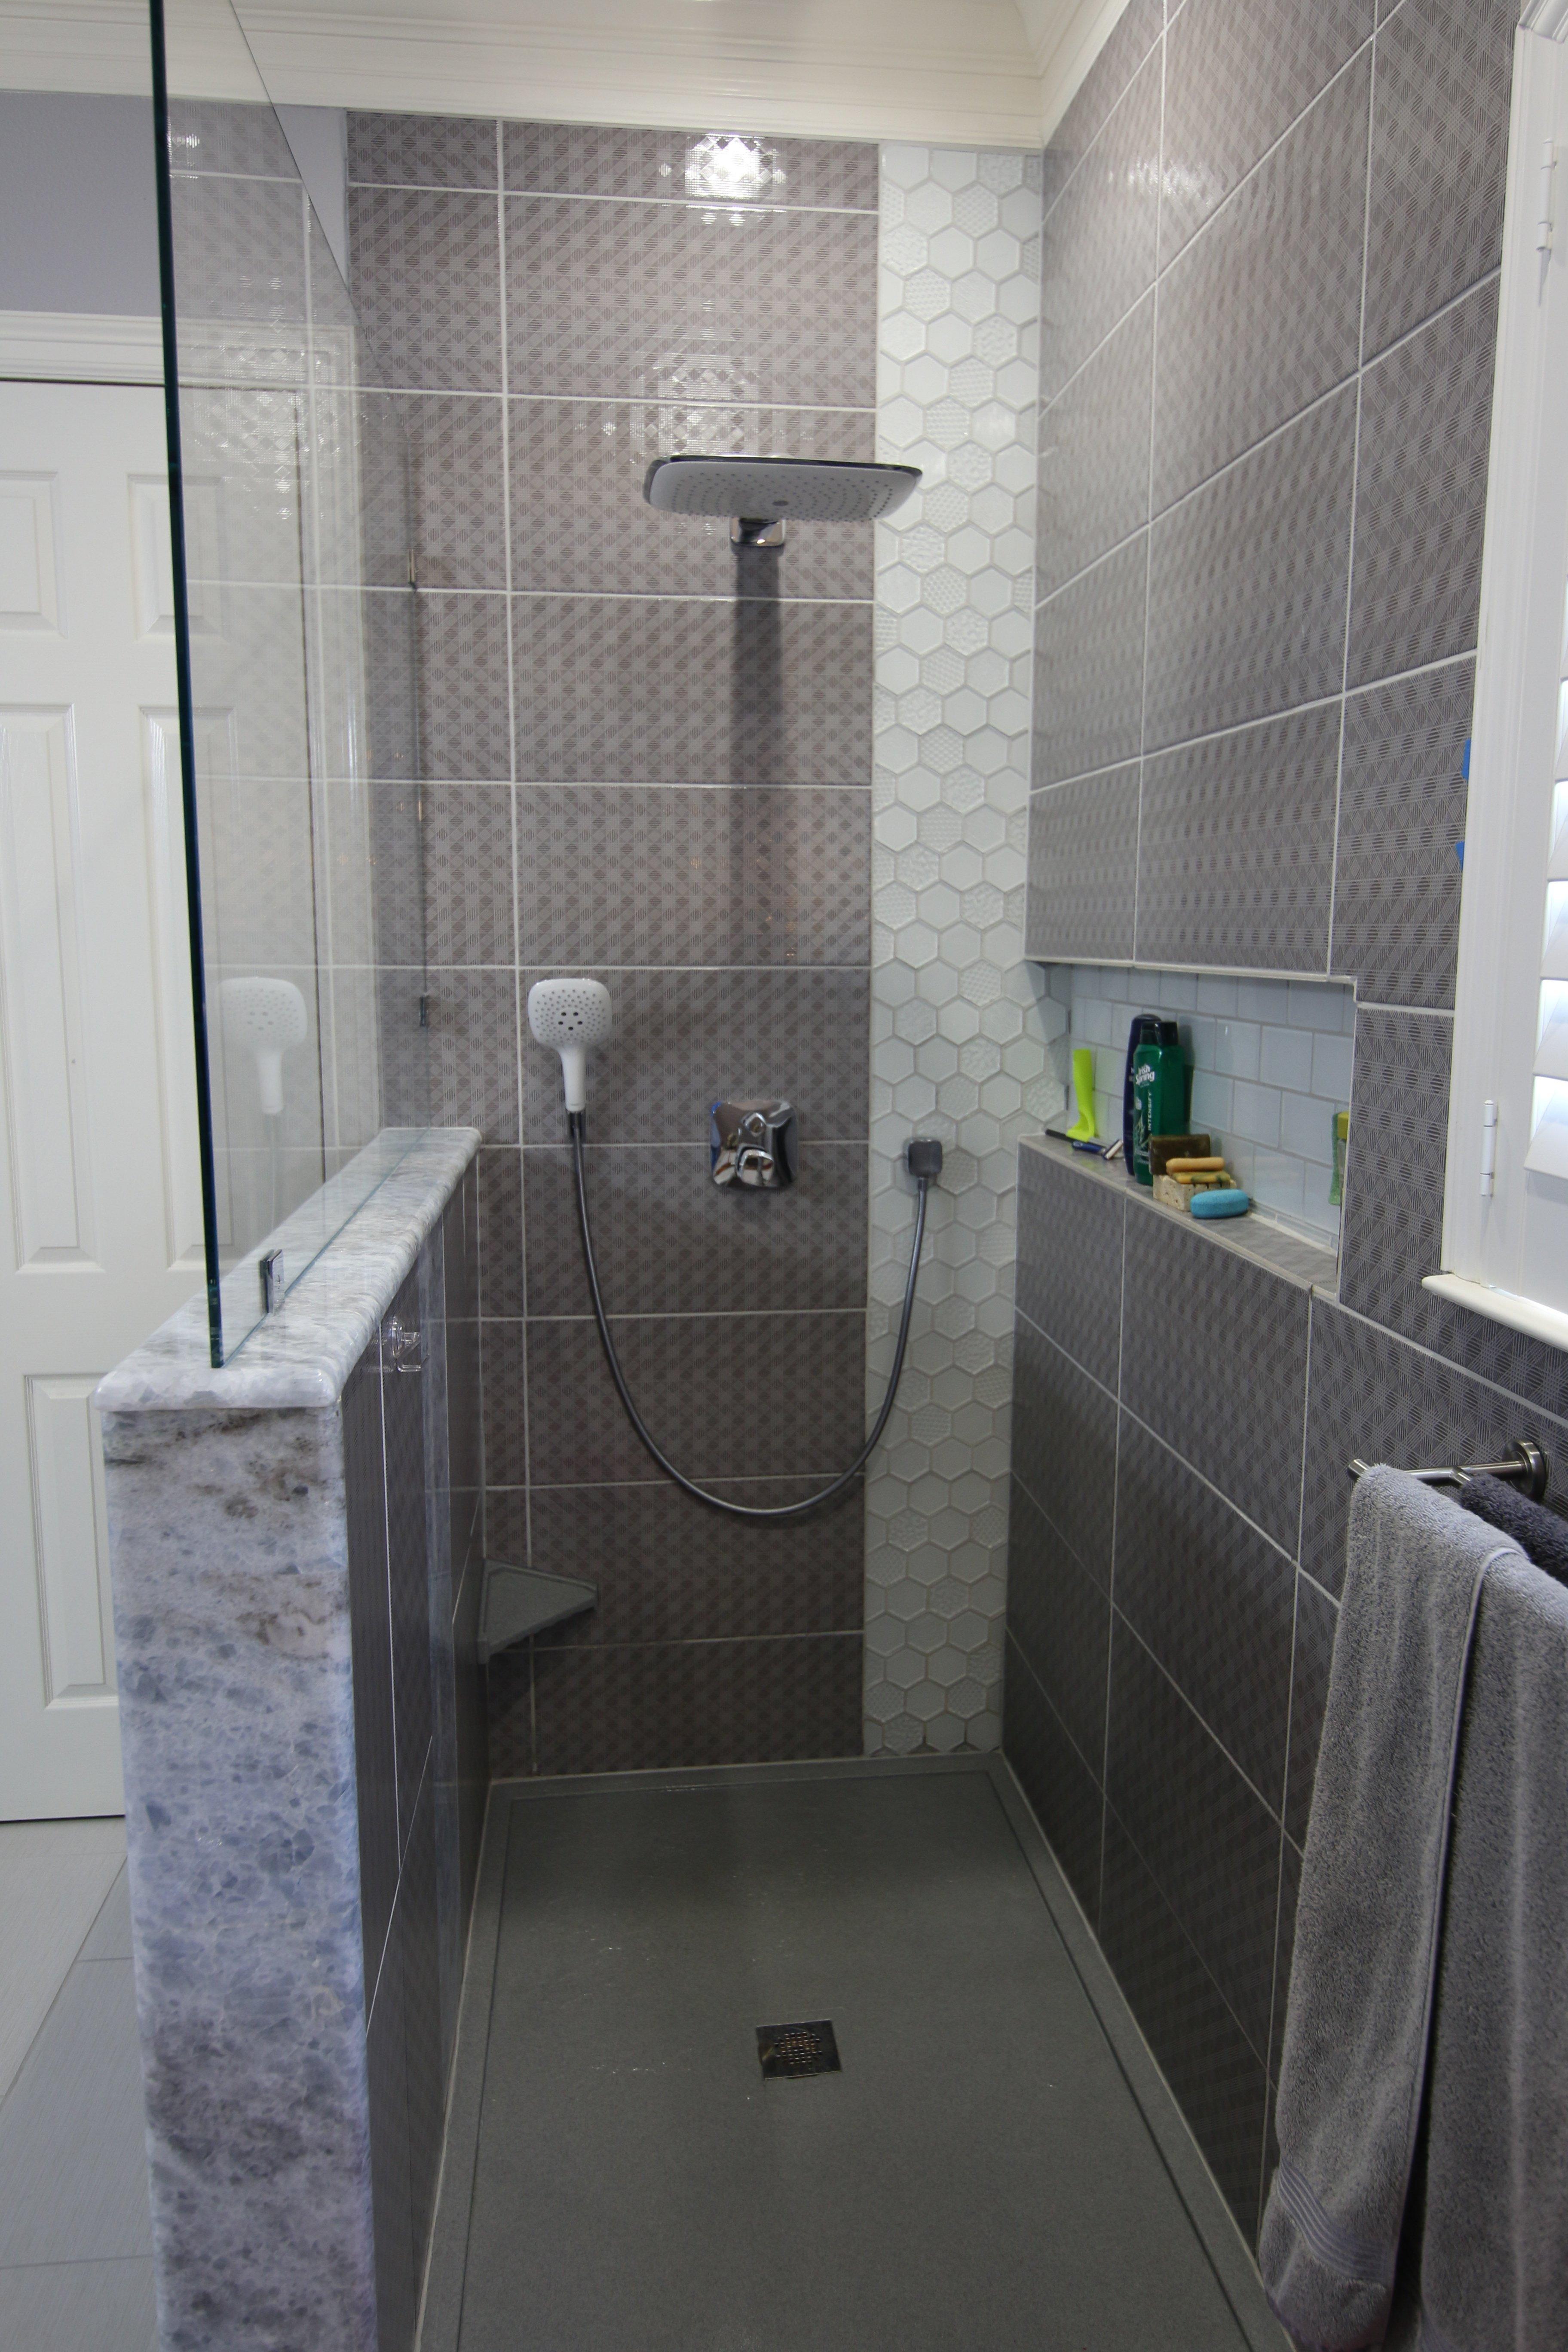 austin bathroom remodeling. Fine Bathroom Remodels In Austin Austin Bathroom Remodeling